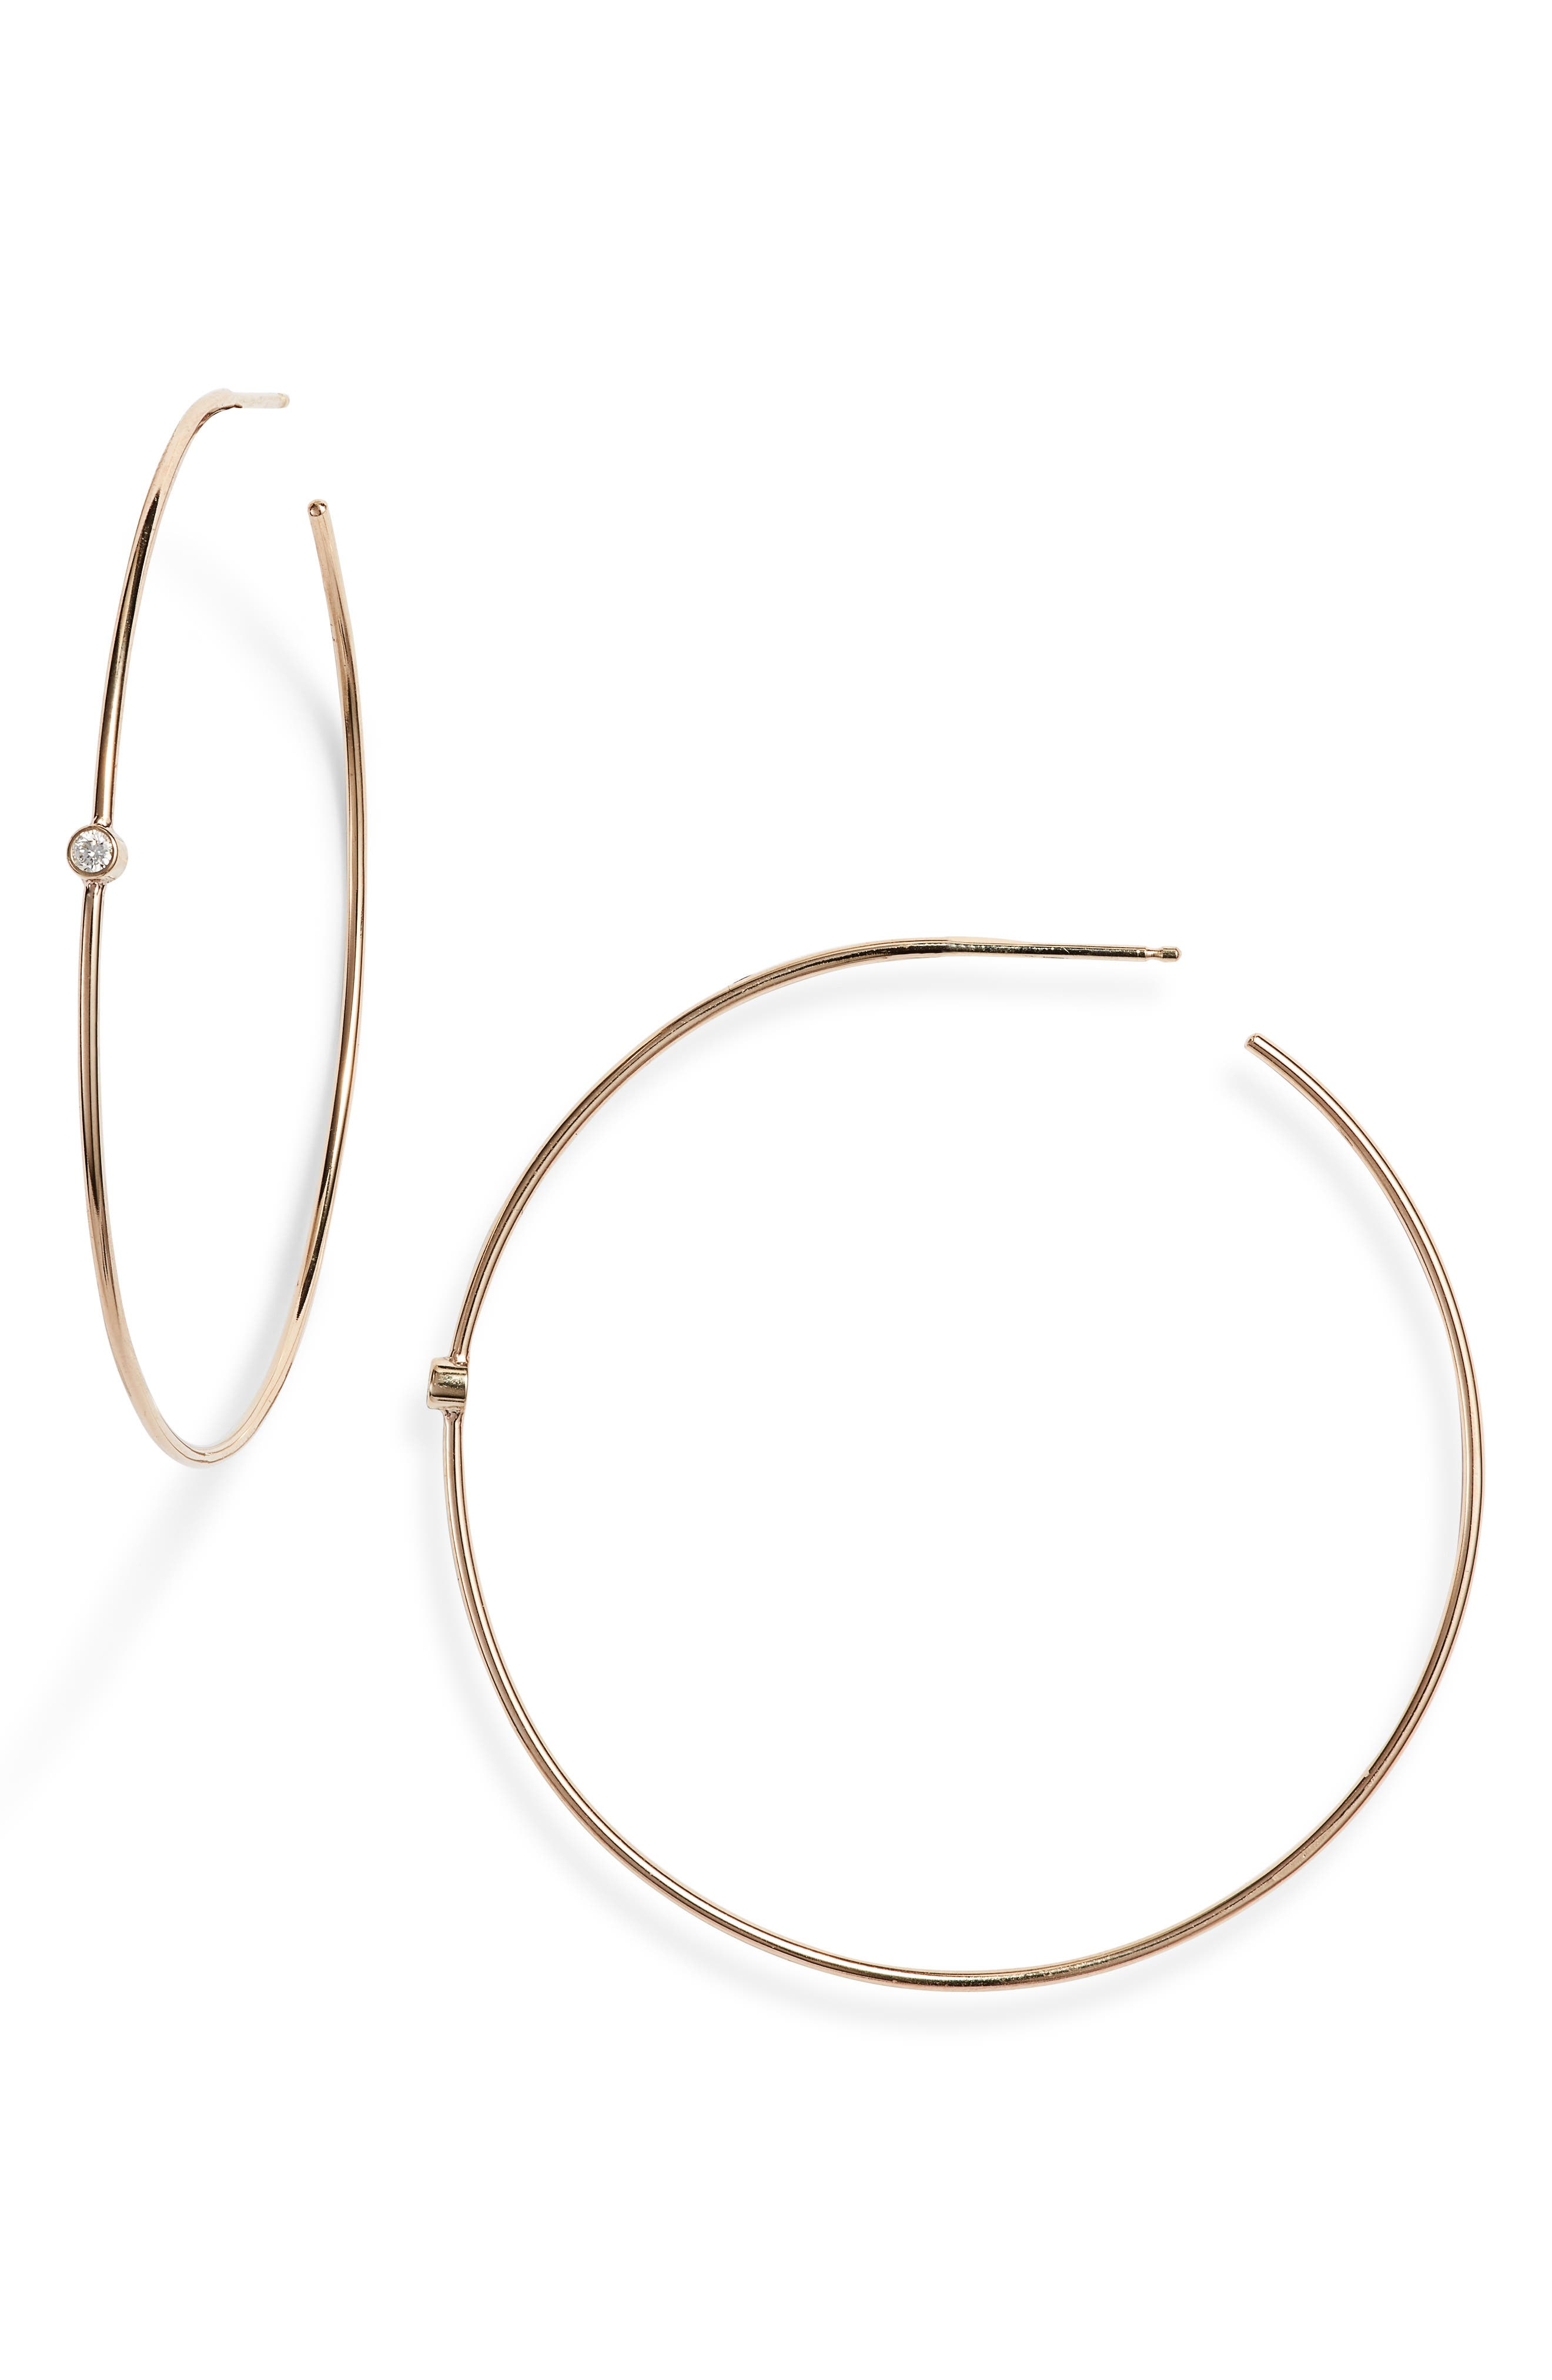 Zoe Chicco Diamond Hoop Earrings